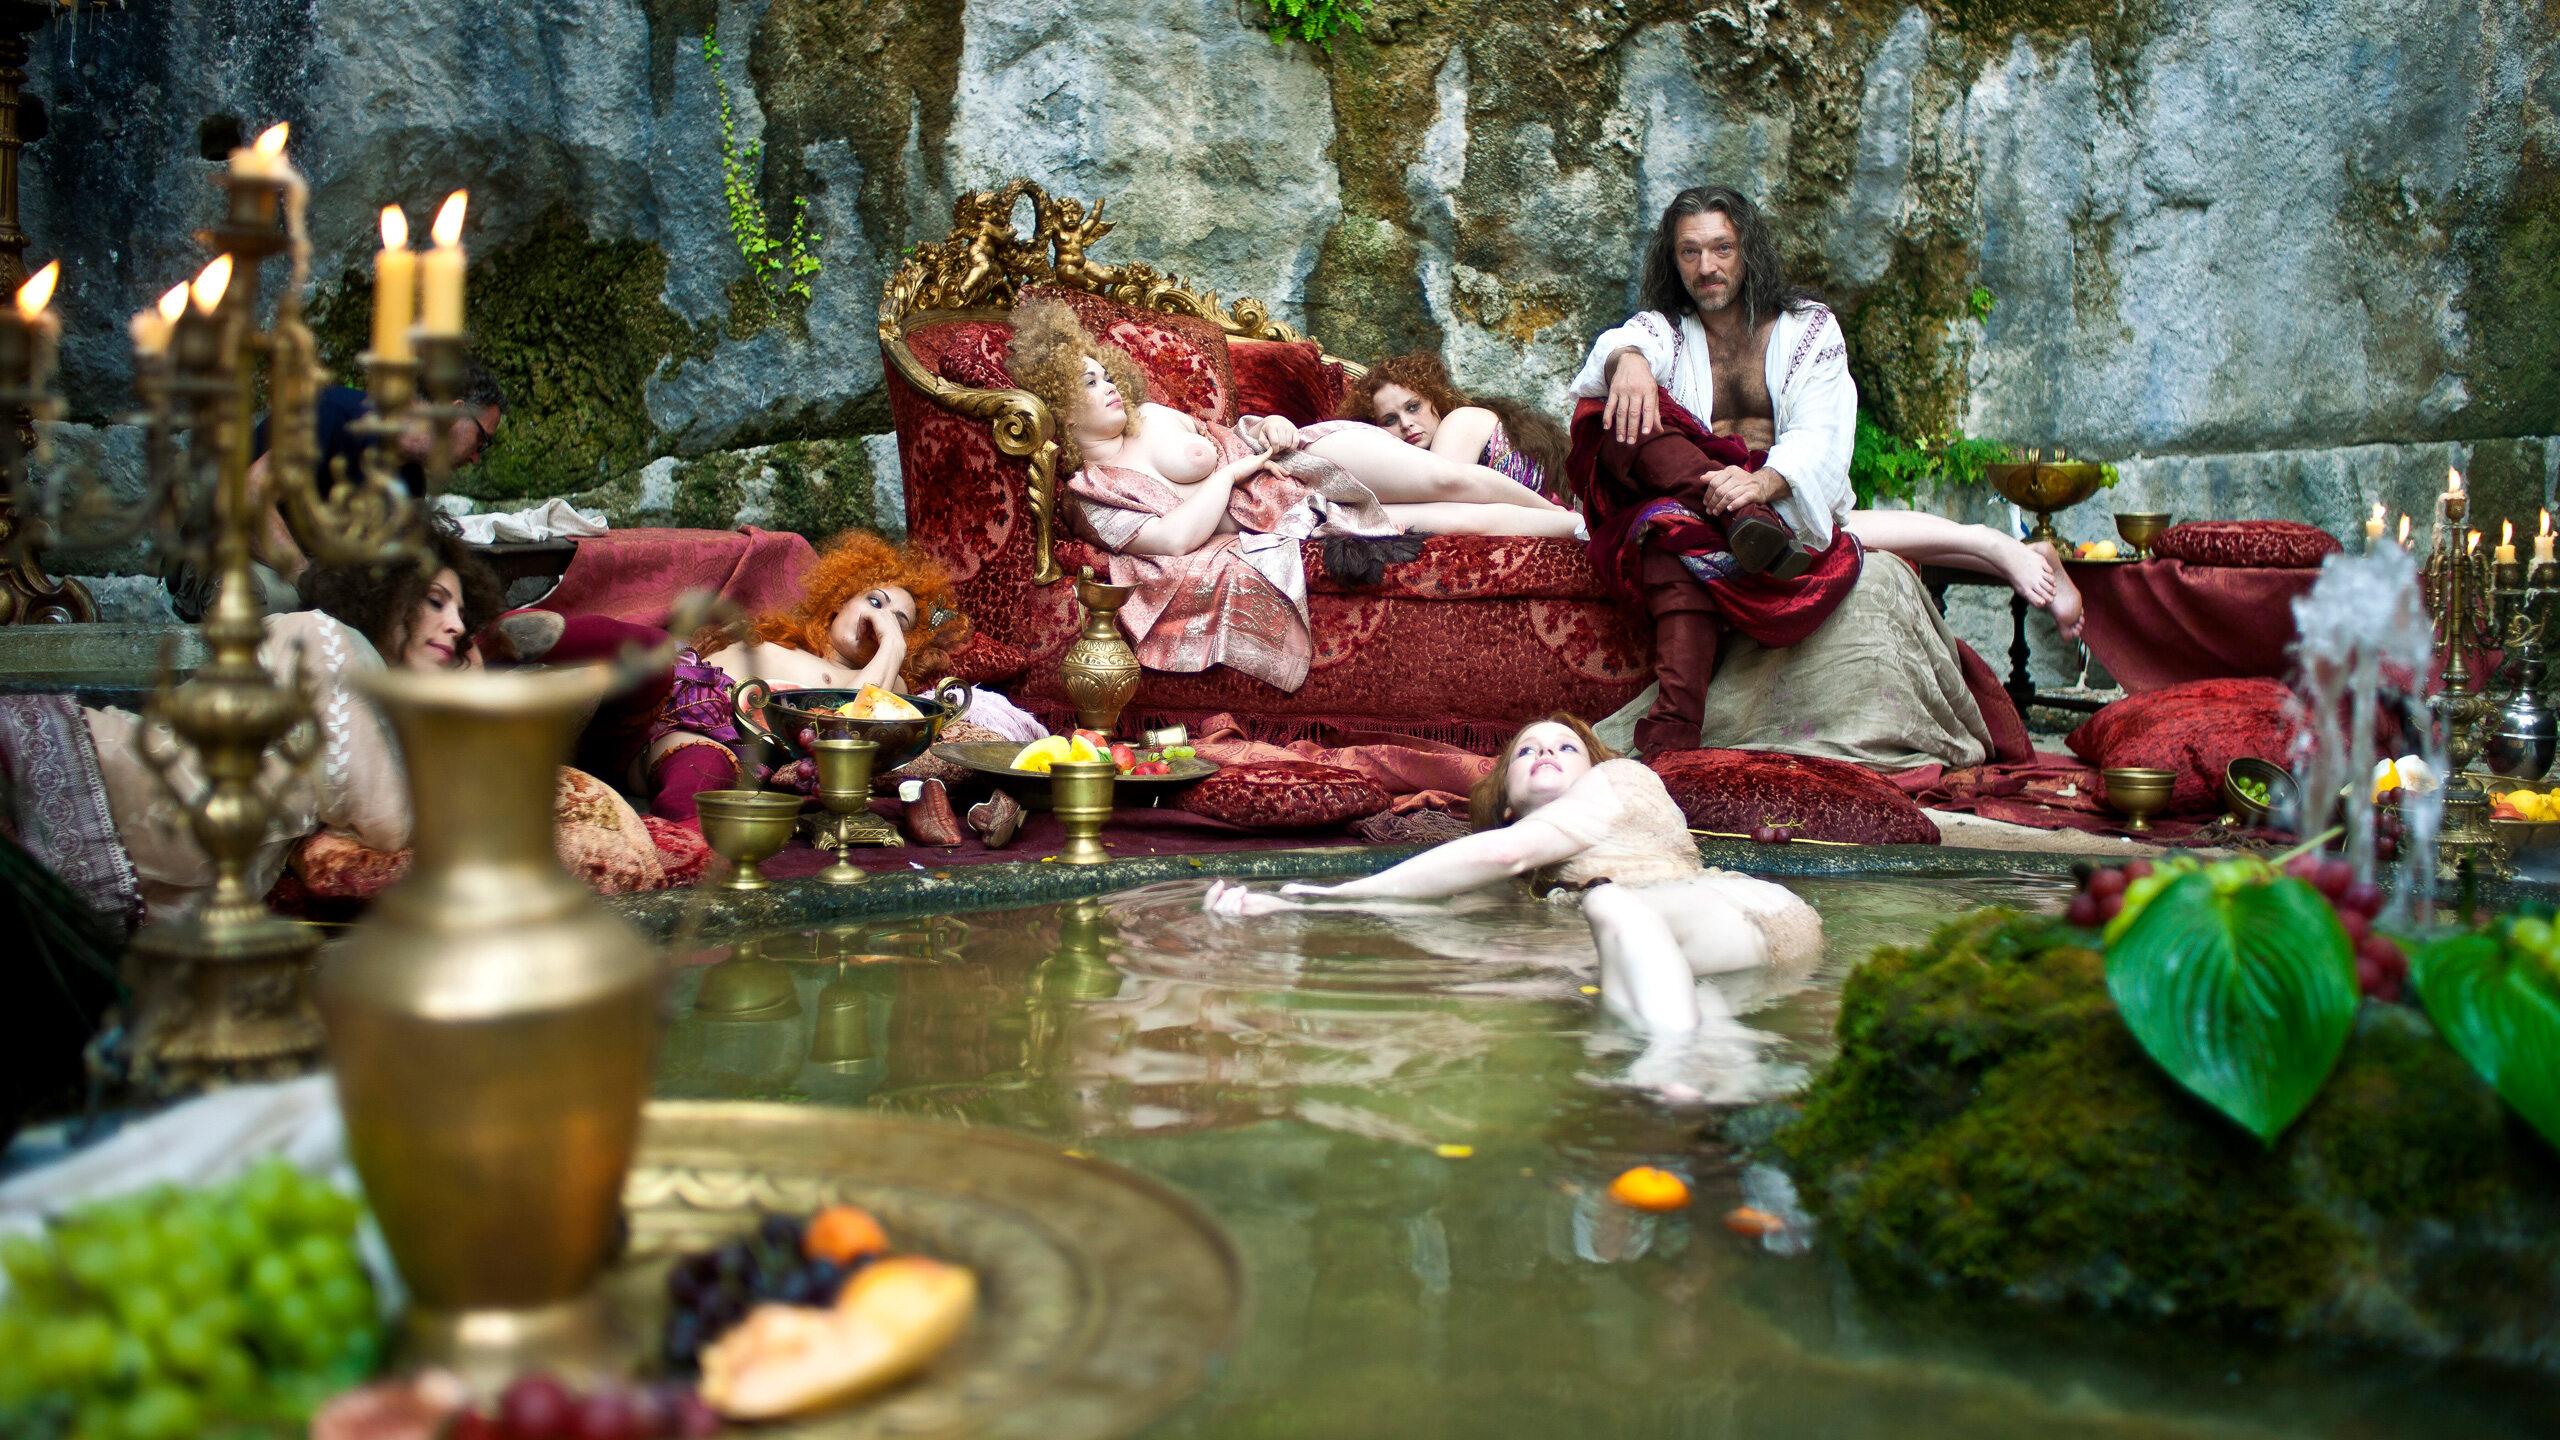 Vincent Cassell w roli lubieżnego króla. Pentameron (2015)